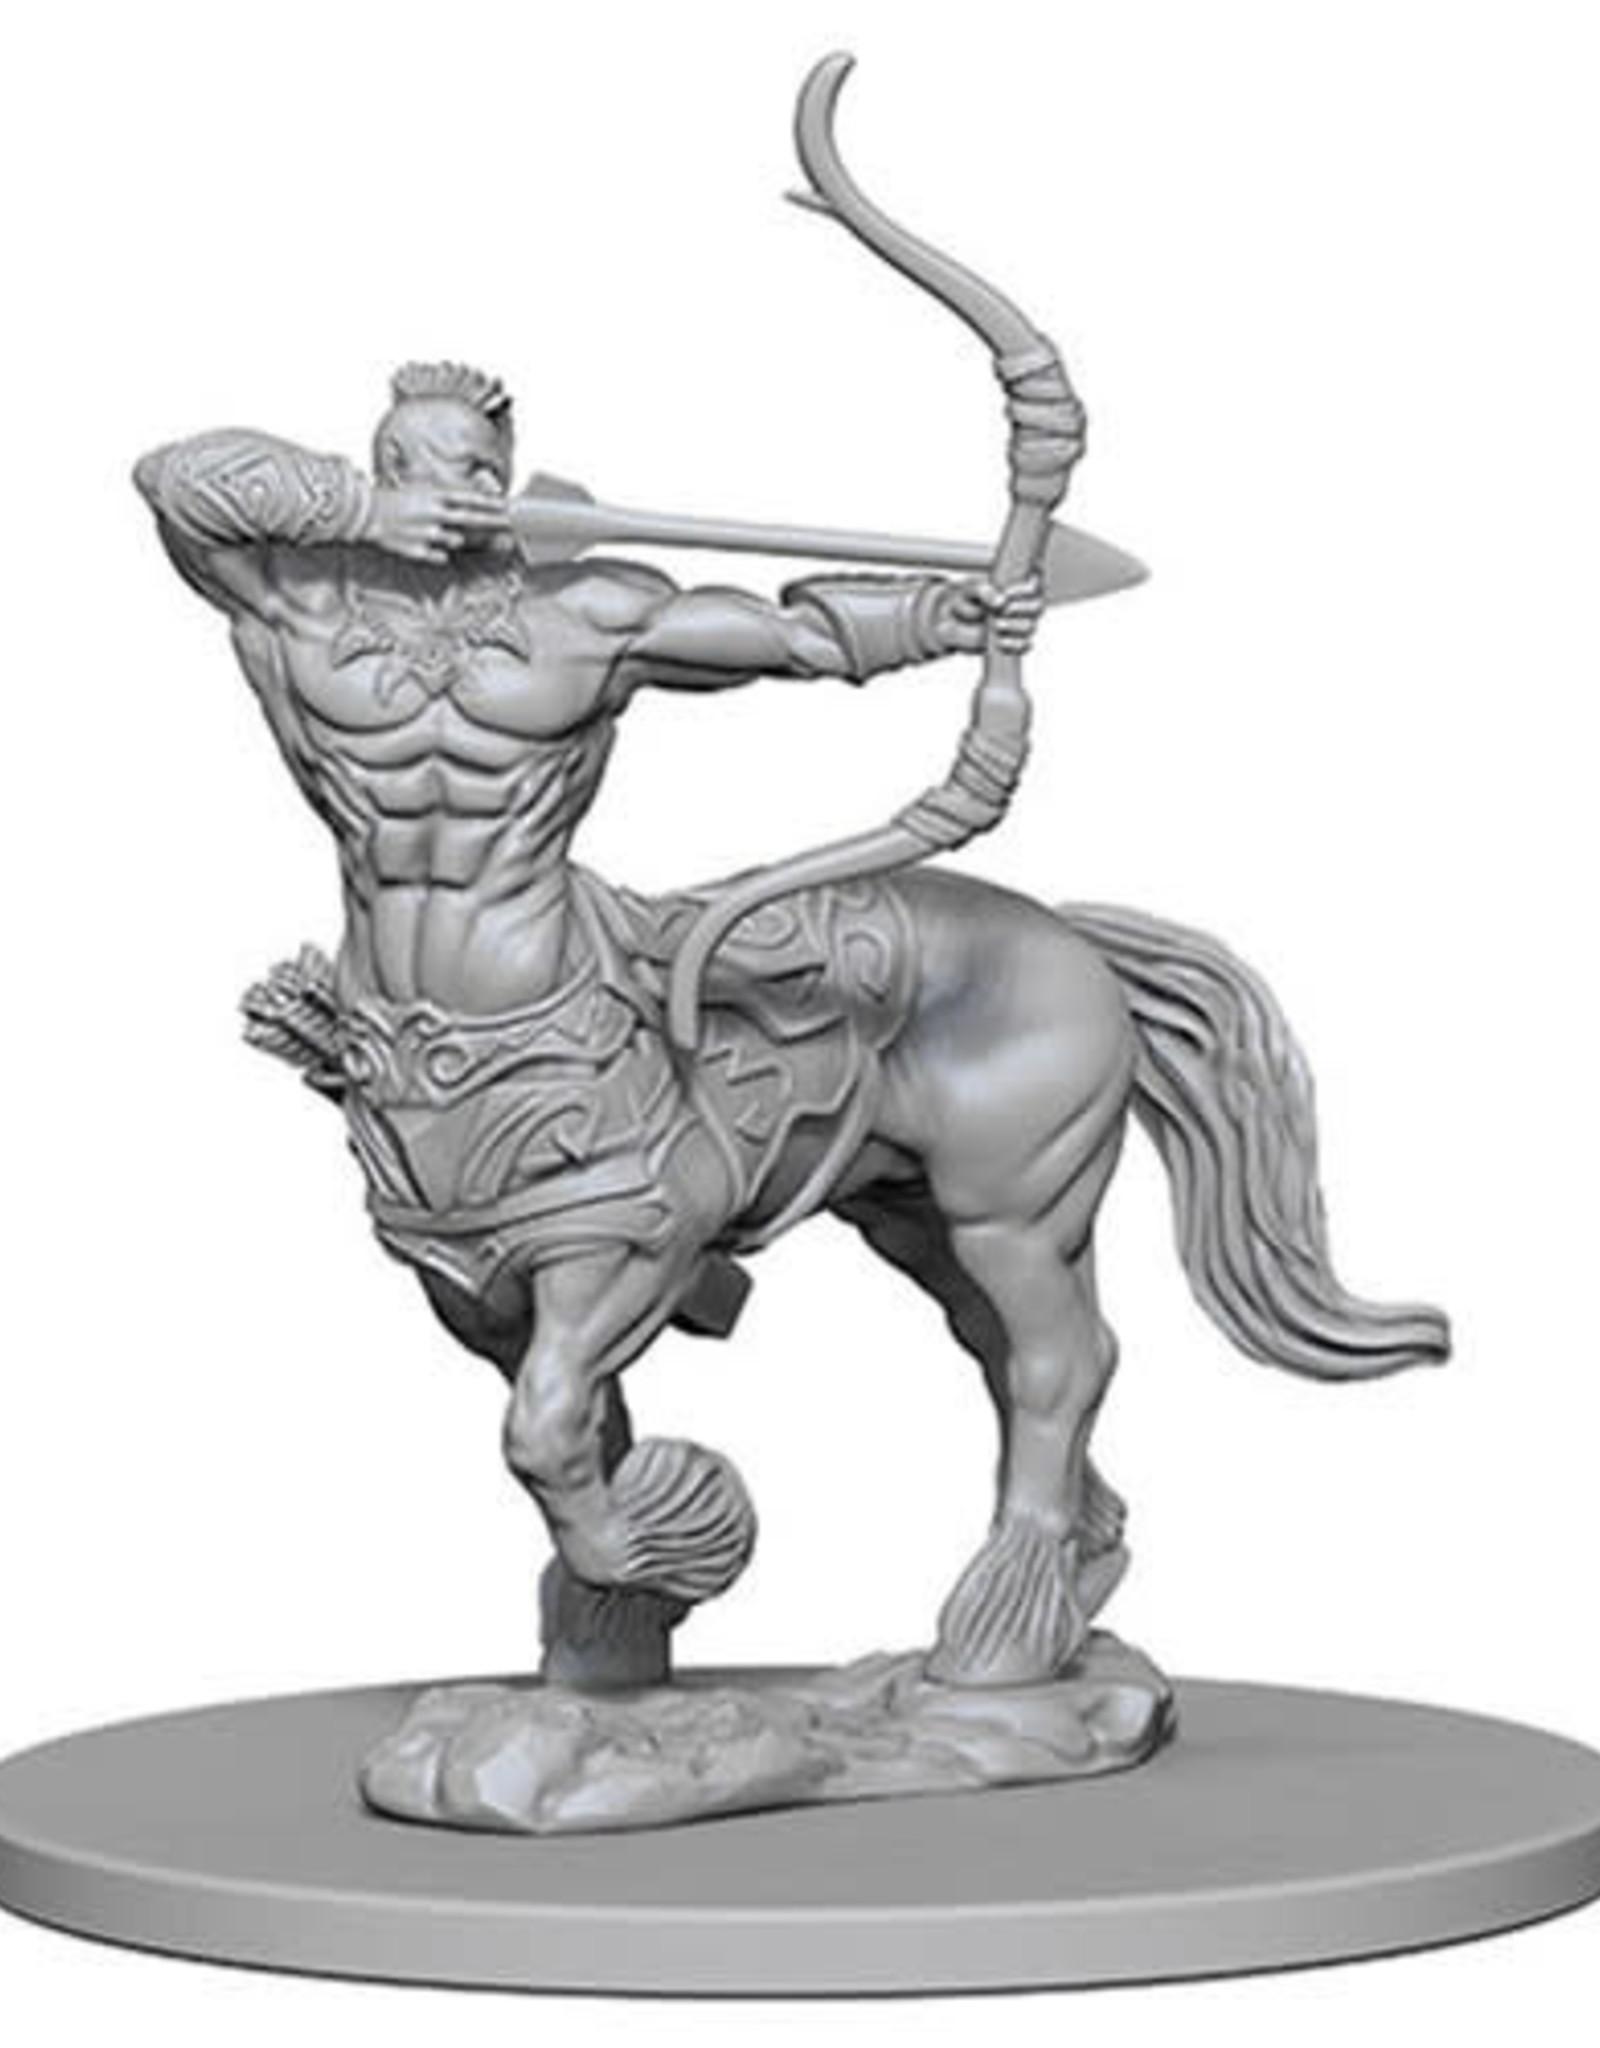 WizKids D&D Nolzur Centaur